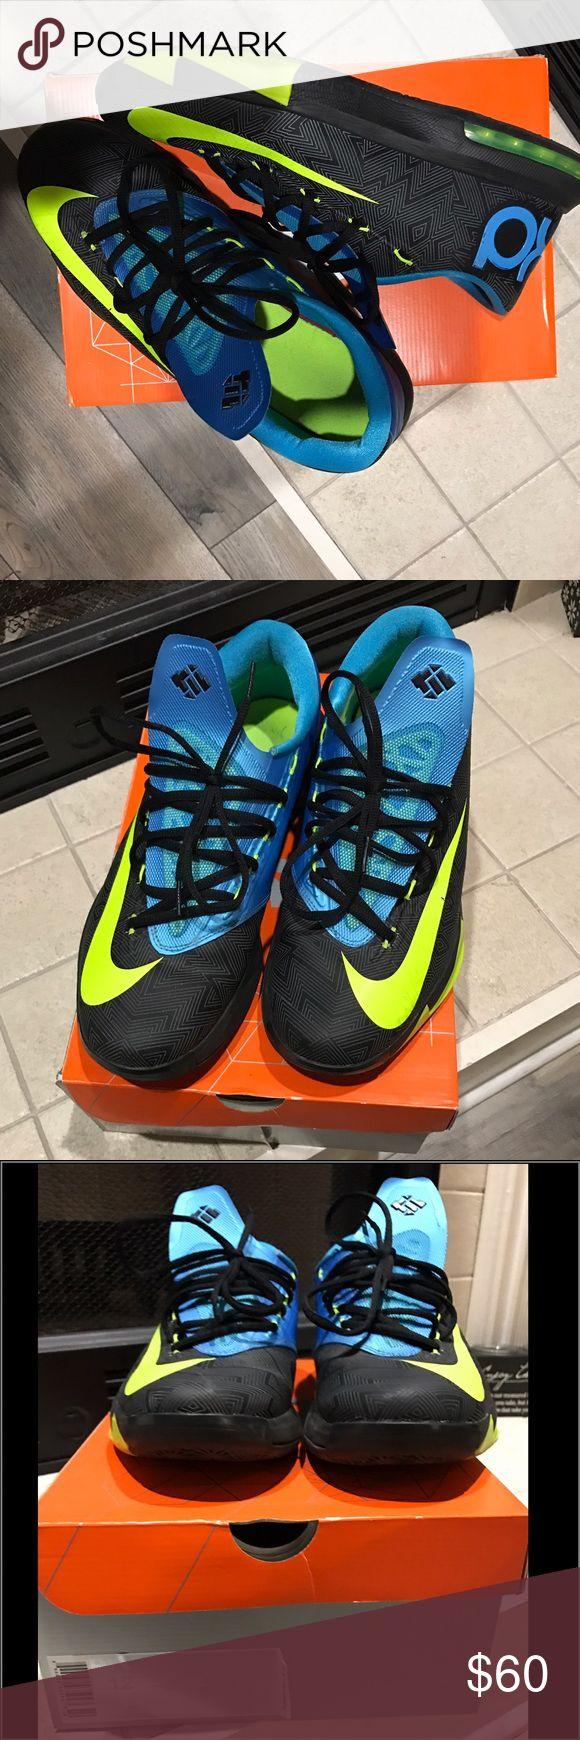 nike orange sneakers durant nike shoes